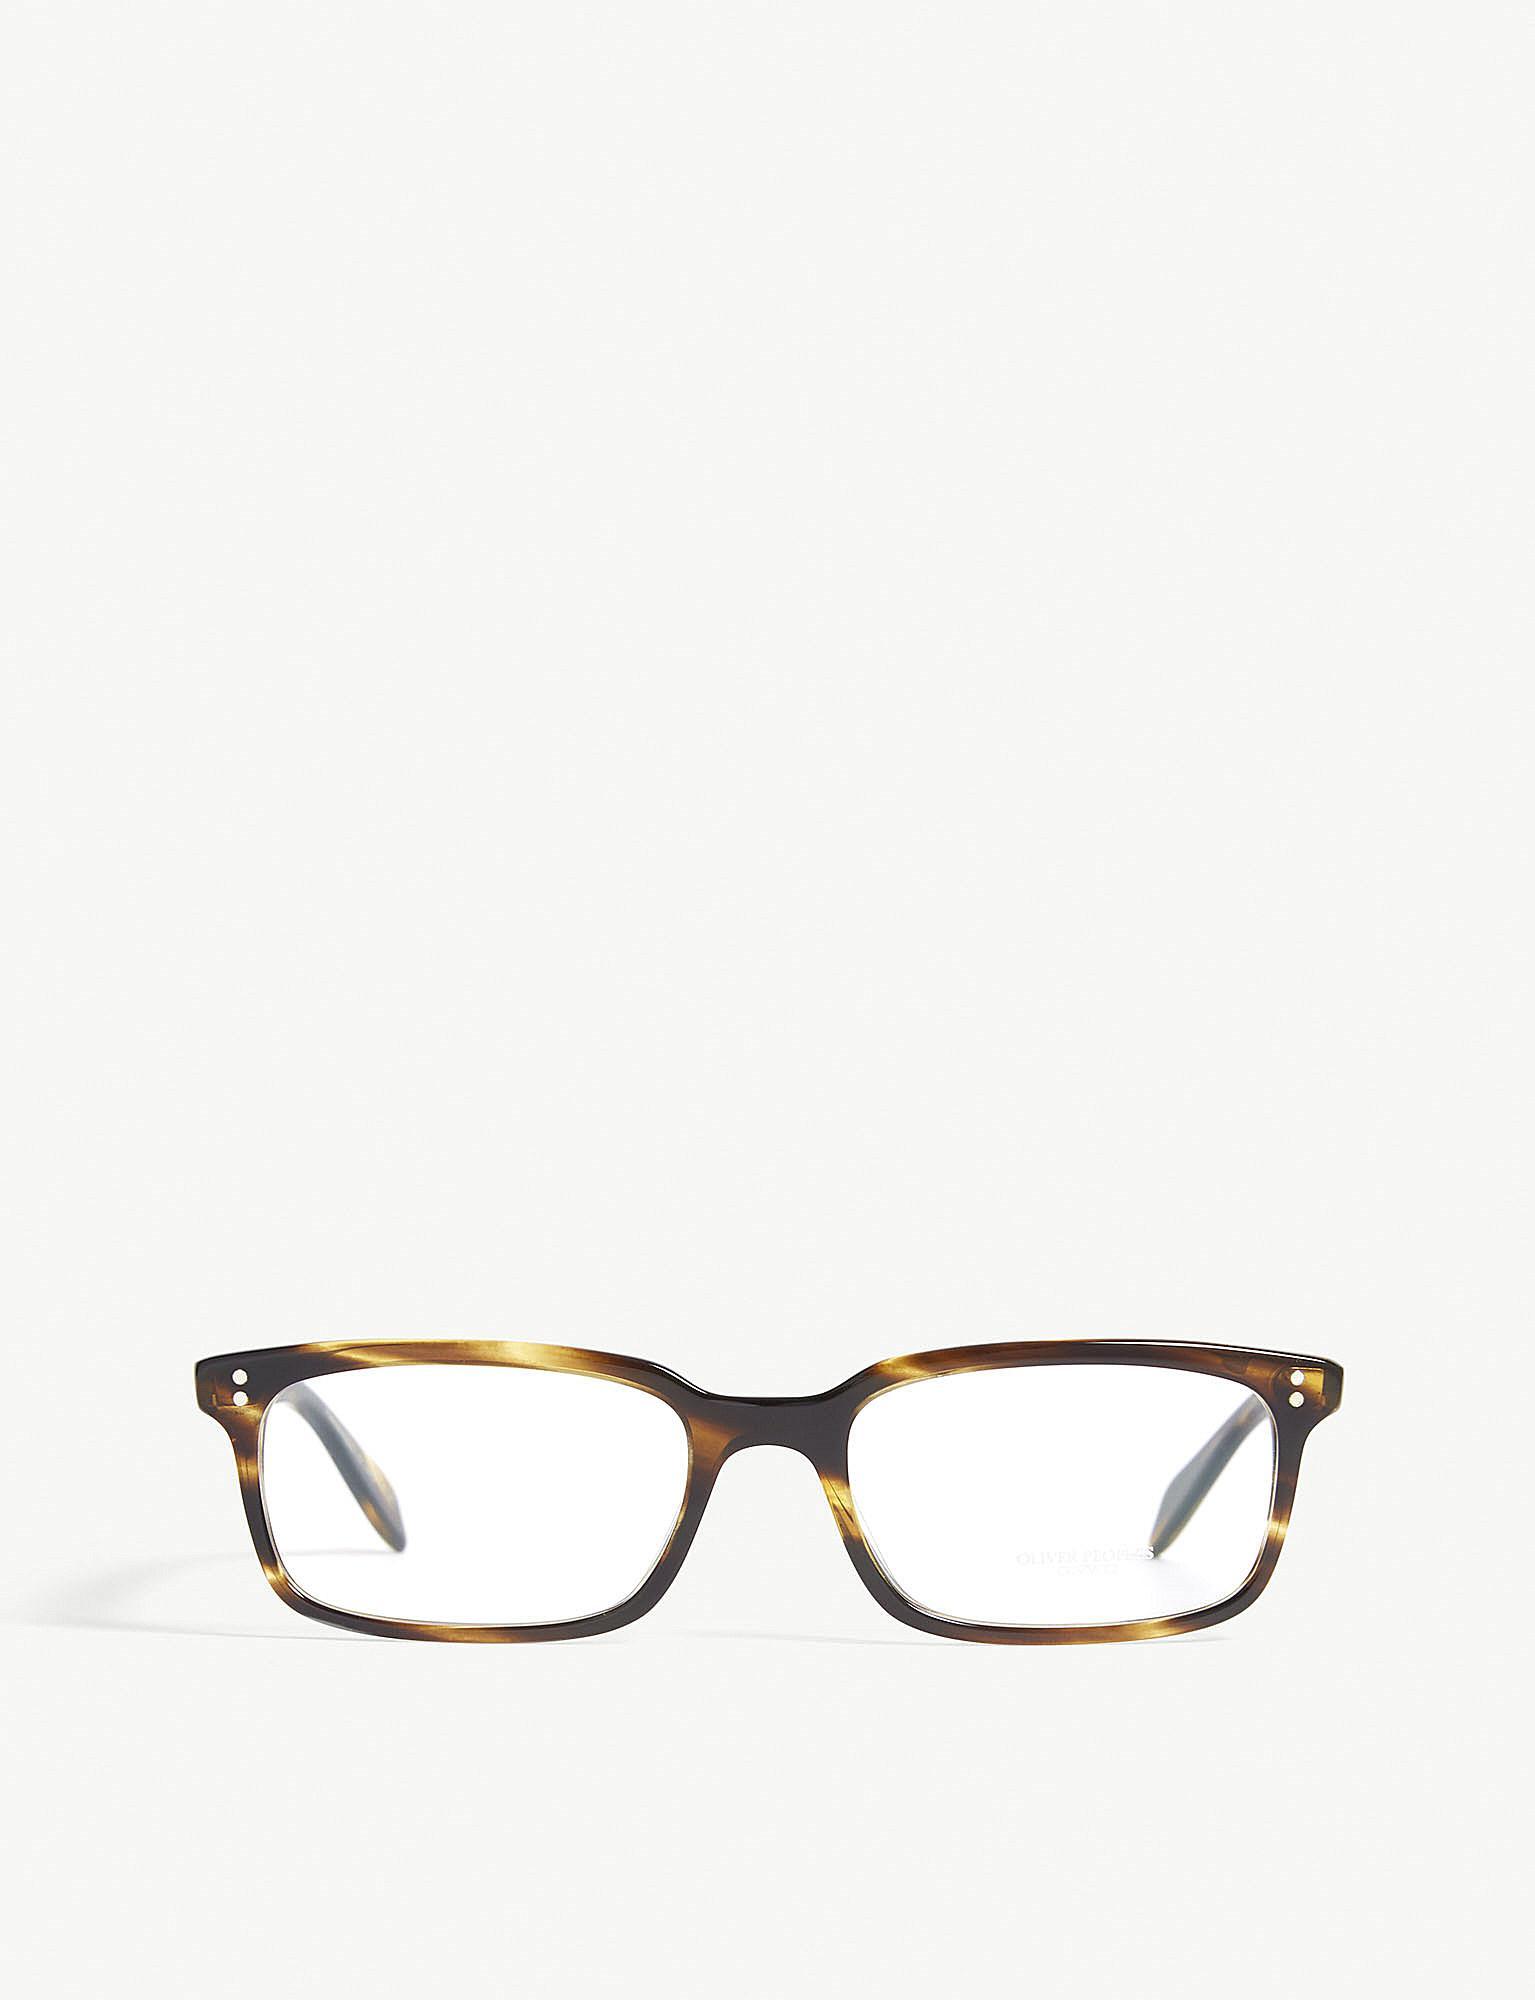 ec15a03f3fb Oliver Peoples Denison Square-frame Optical Glasses in Brown - Lyst